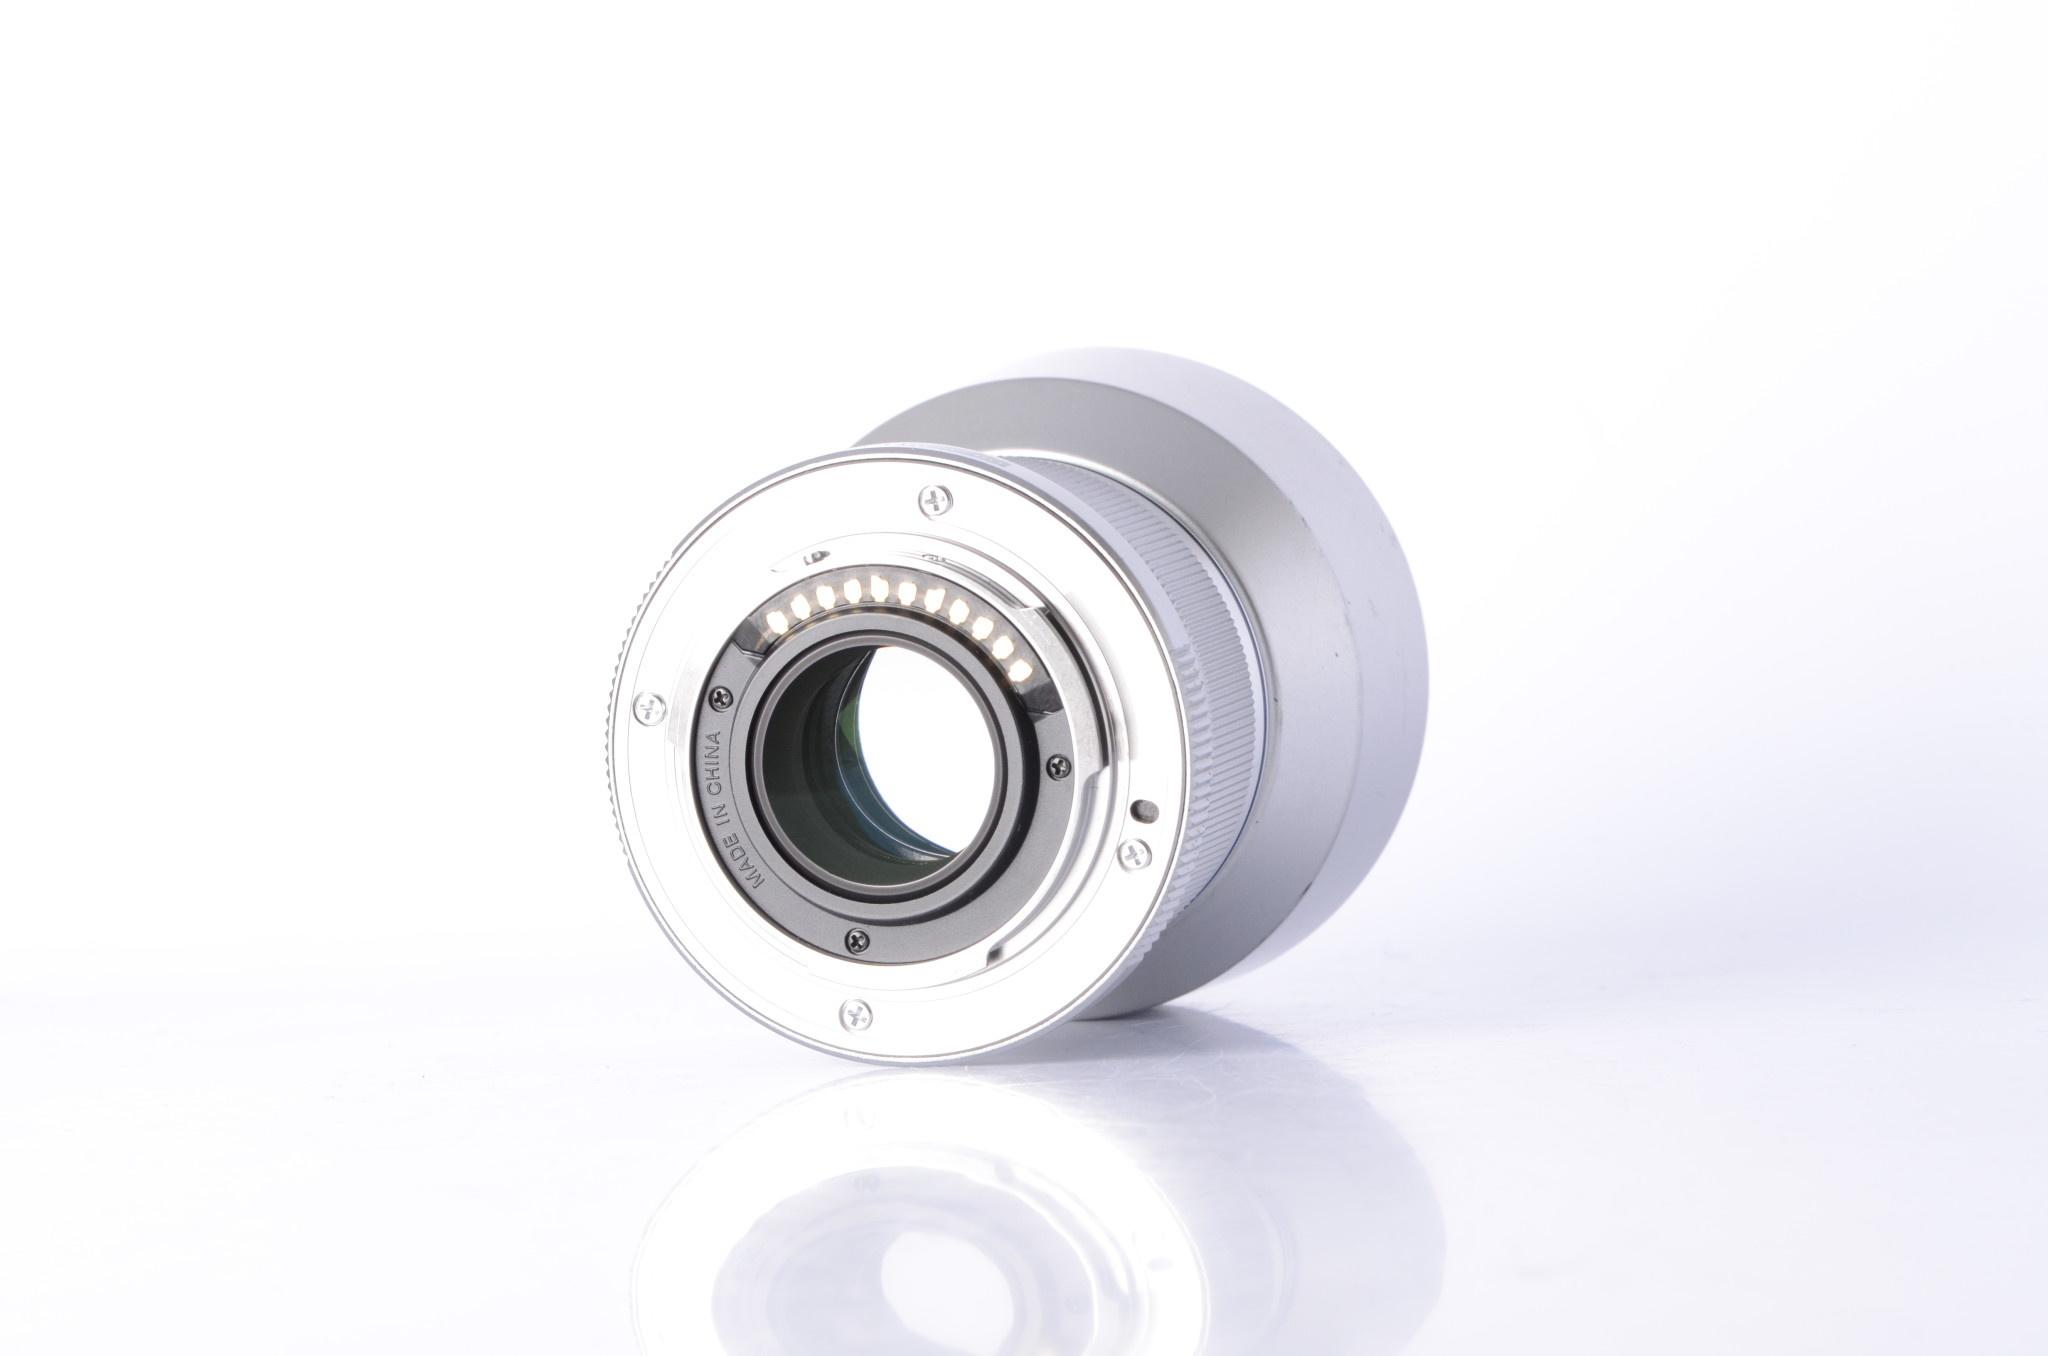 Olympus Olympus 45mm f/1.8 MSC Lens *